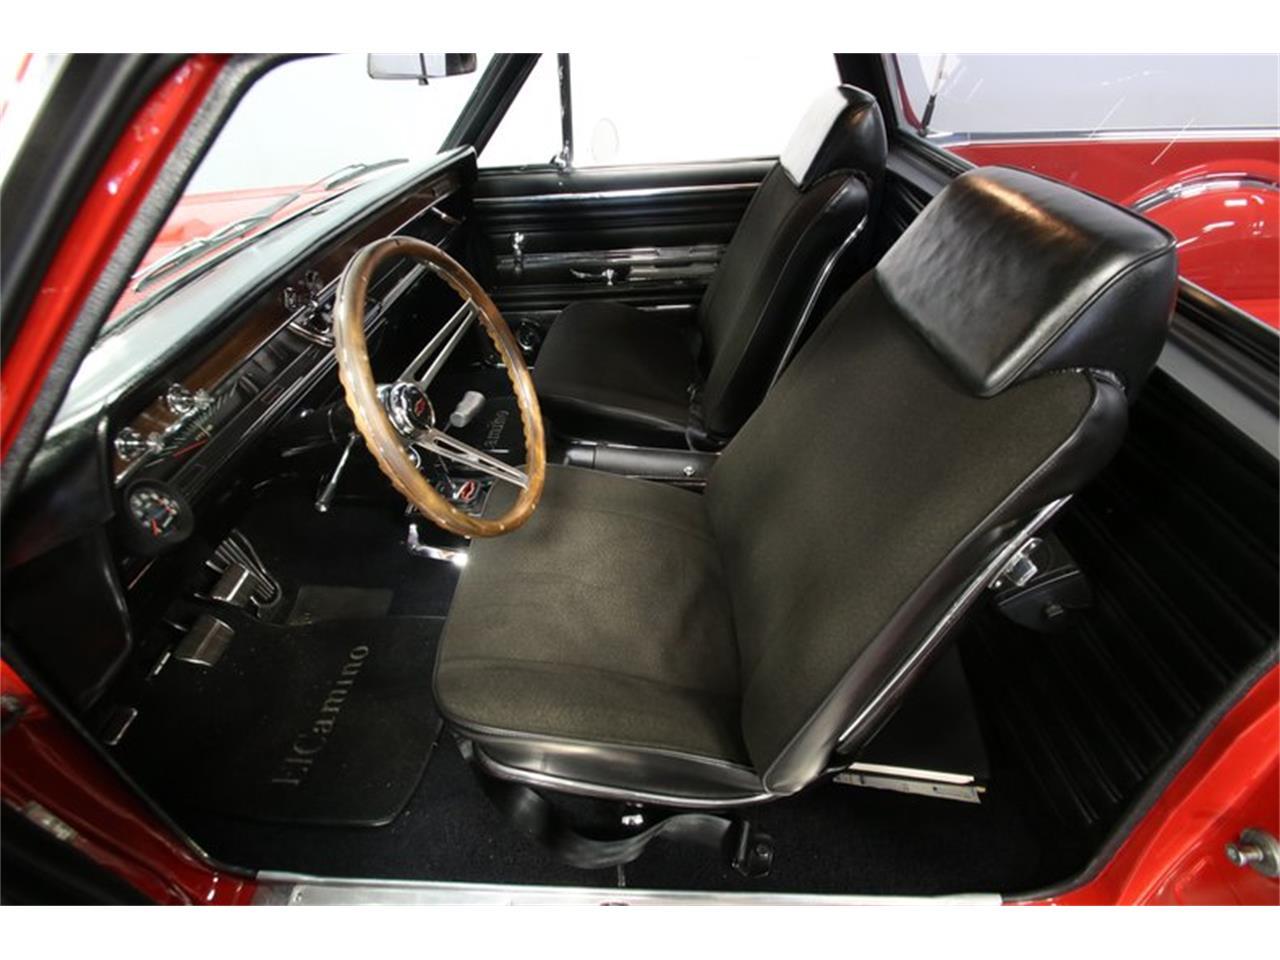 1966 Chevrolet El Camino (CC-1412071) for sale in Concord, North Carolina